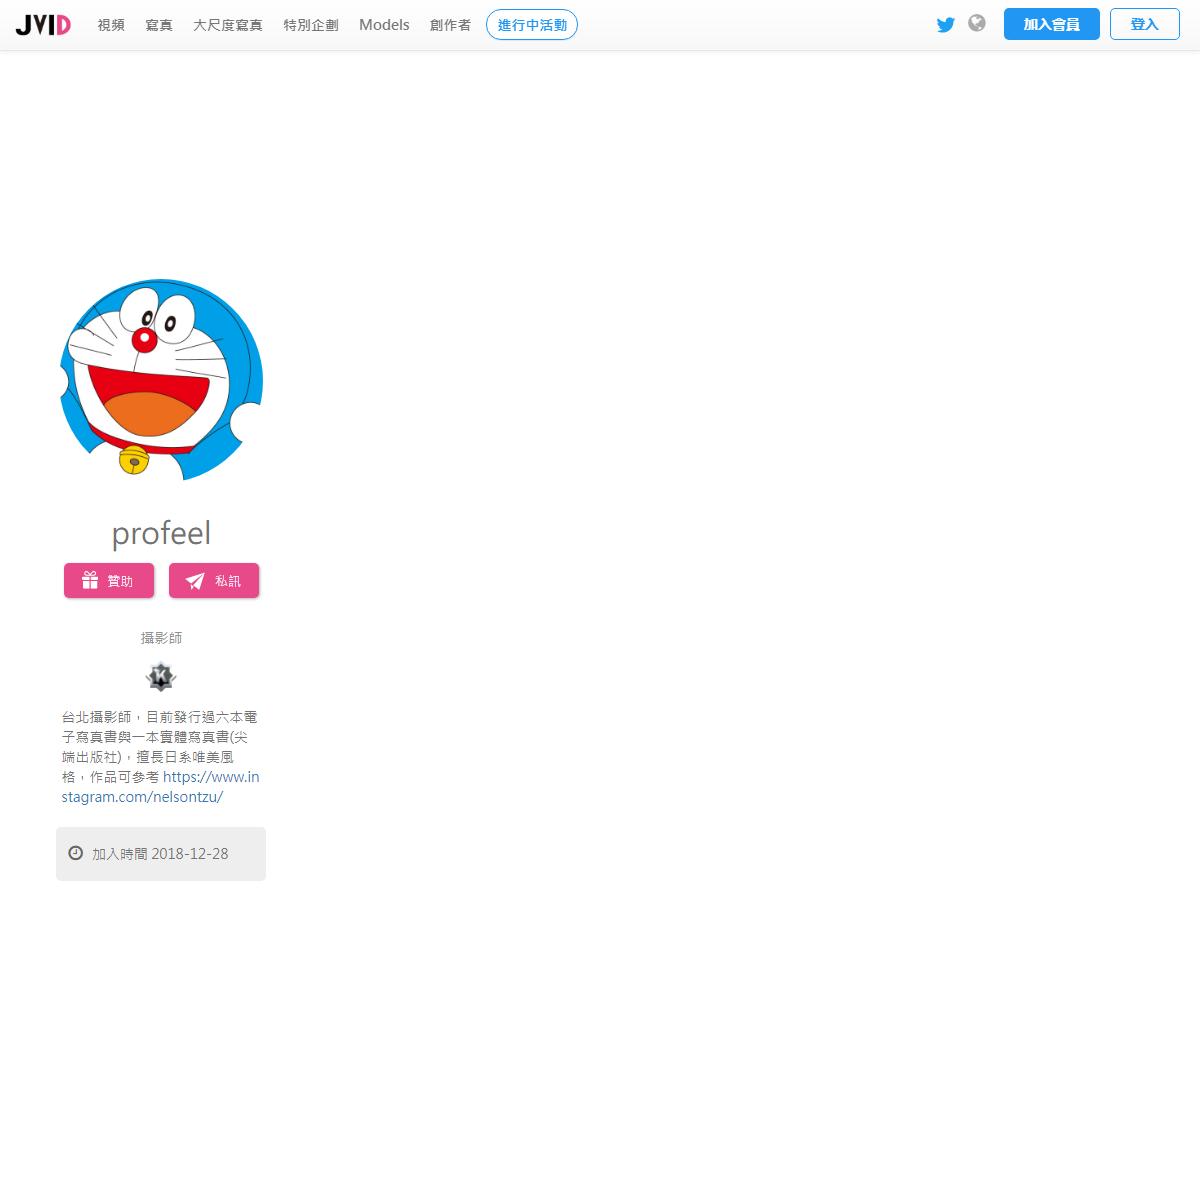 profeel's profile - Jvid.com